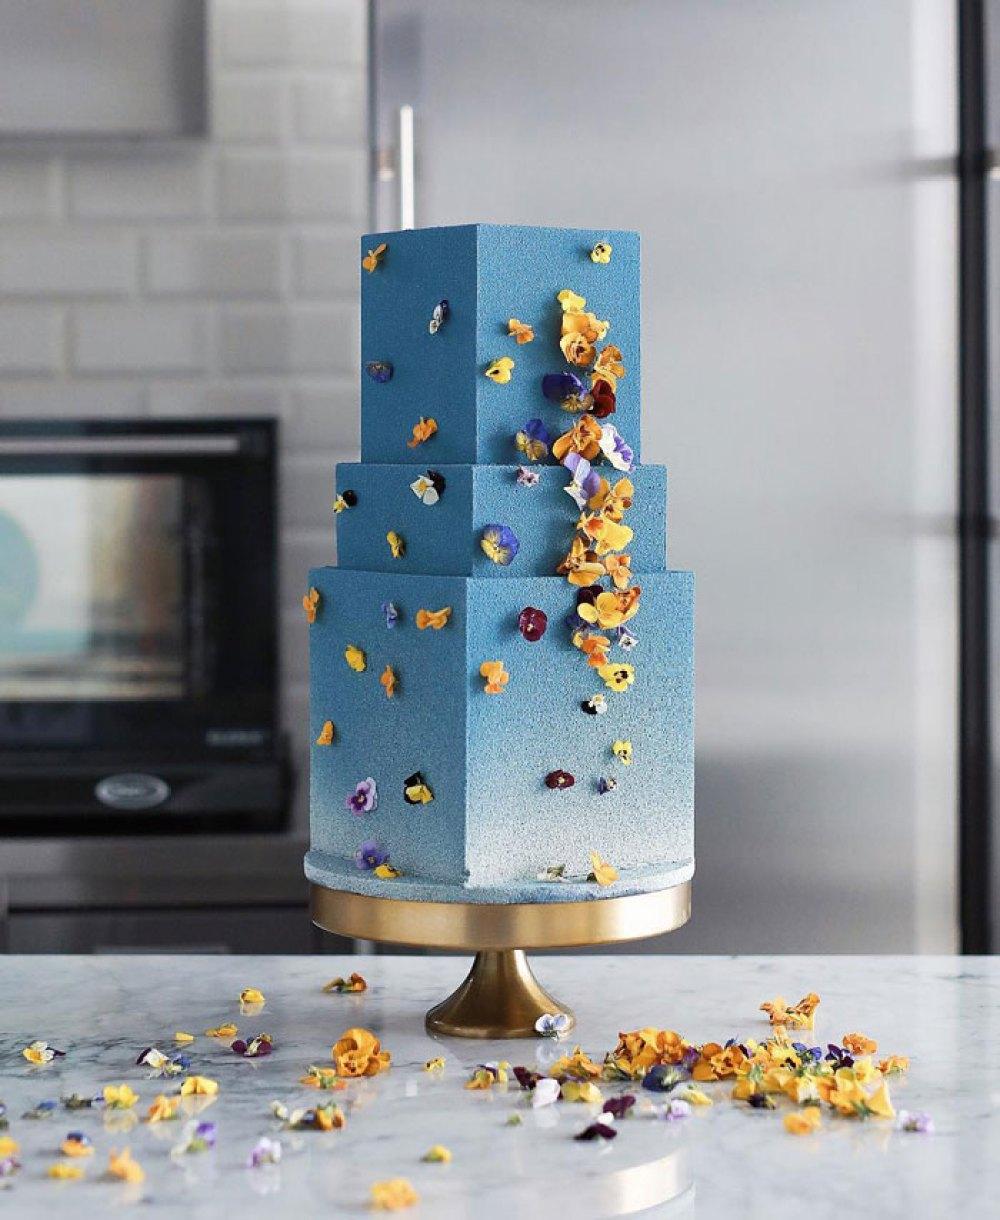 tortik-annushka-artistic-cakes-designs-25-5e82fdf5f0a0d__700